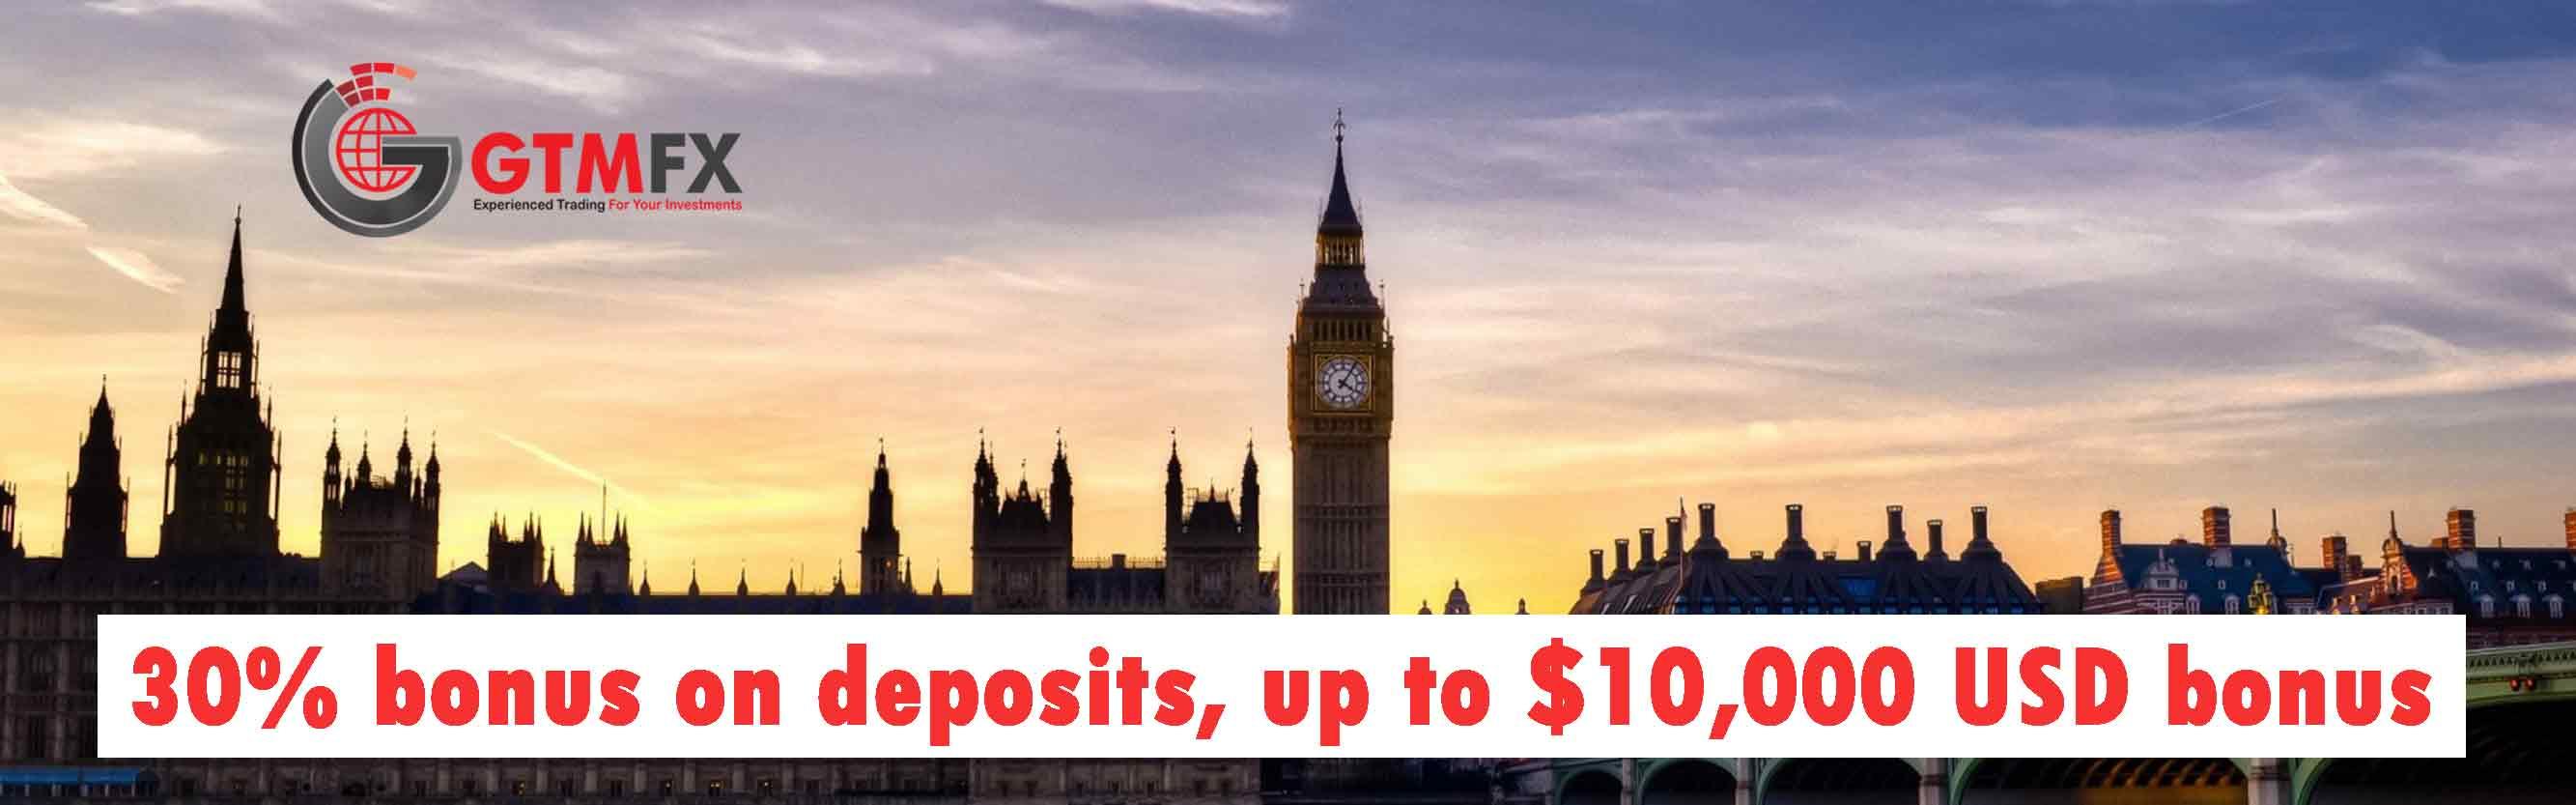 GTMFX-Deposit-Bonus